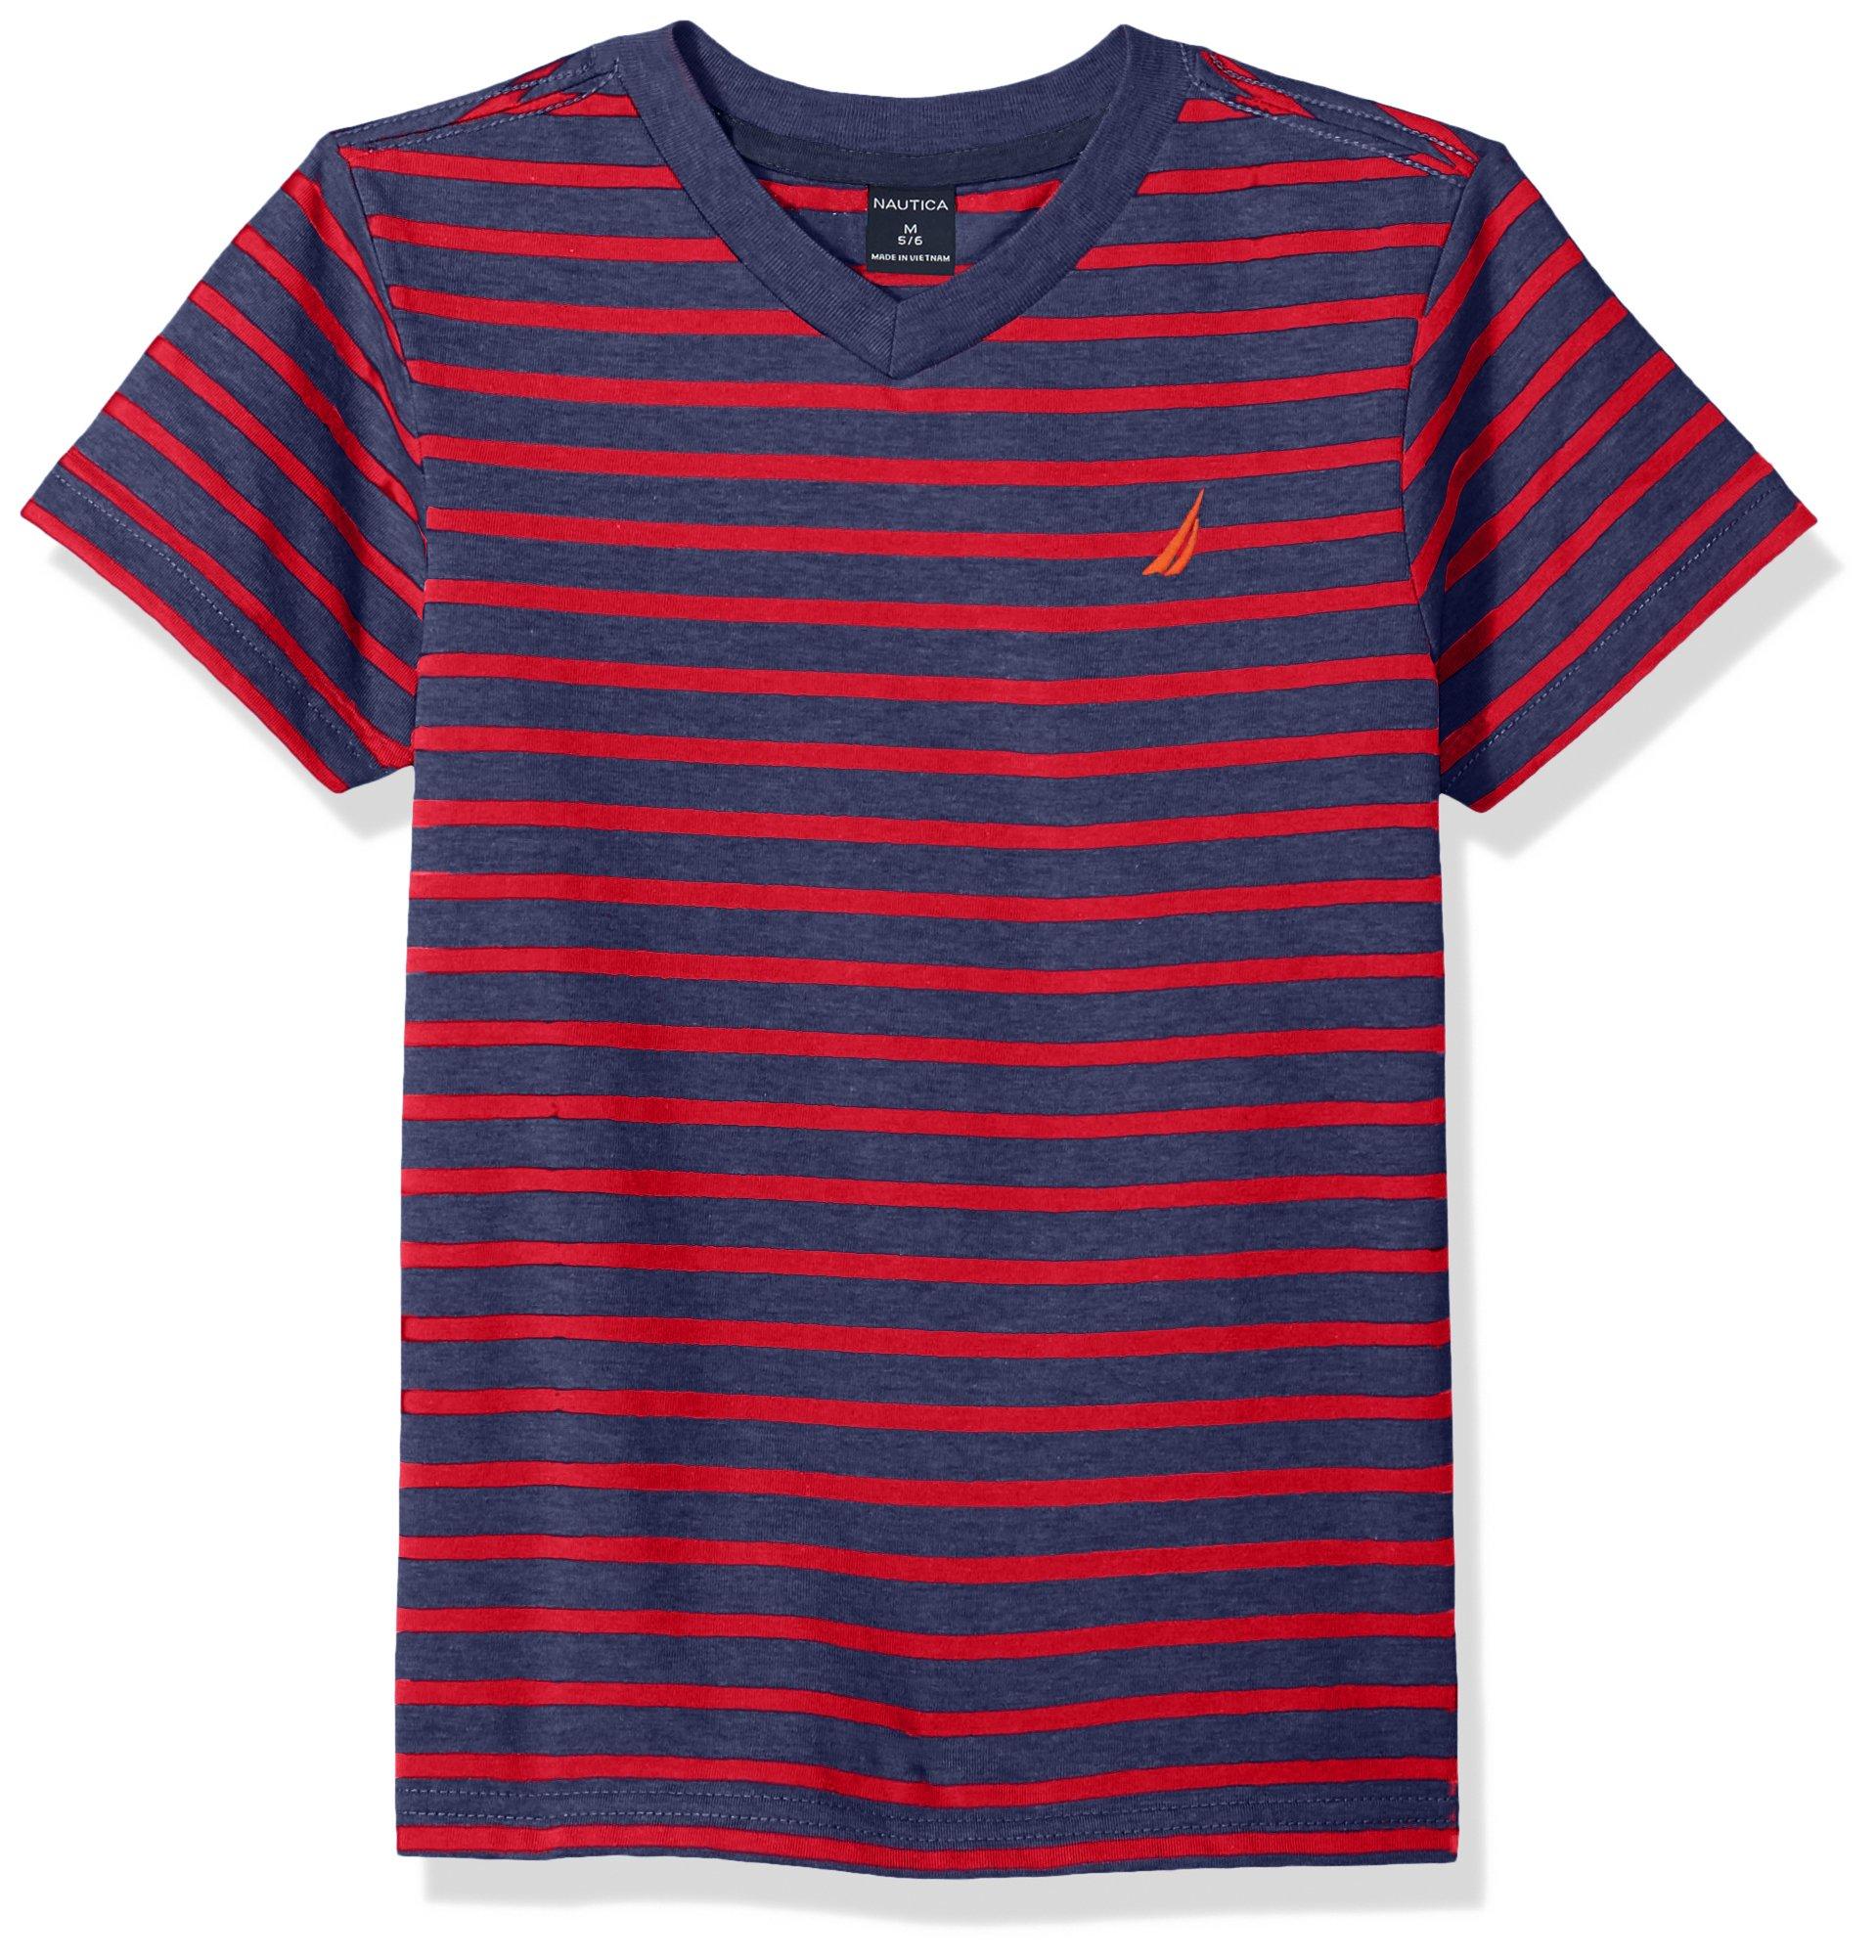 Nautica Big Boys' Short Sleeve Striped V-Neck T-Shirt, Brett Carmine, Large (14/16)